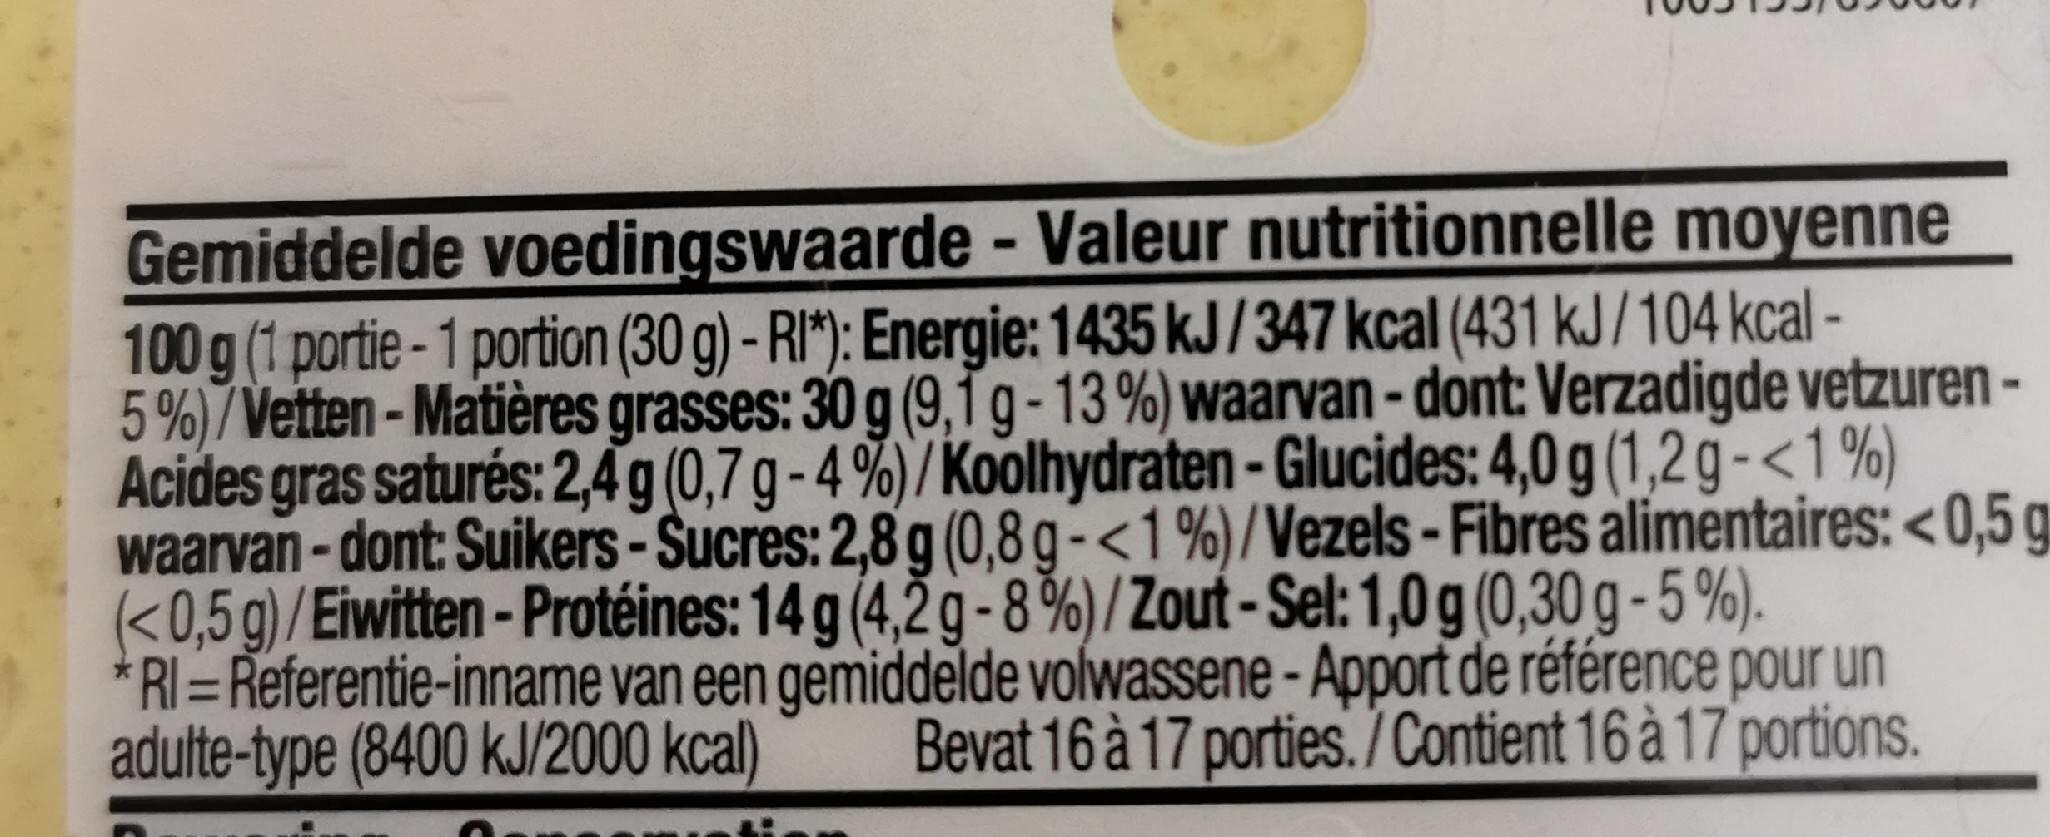 Salade de poulet Curry - Voedingswaarden - fr